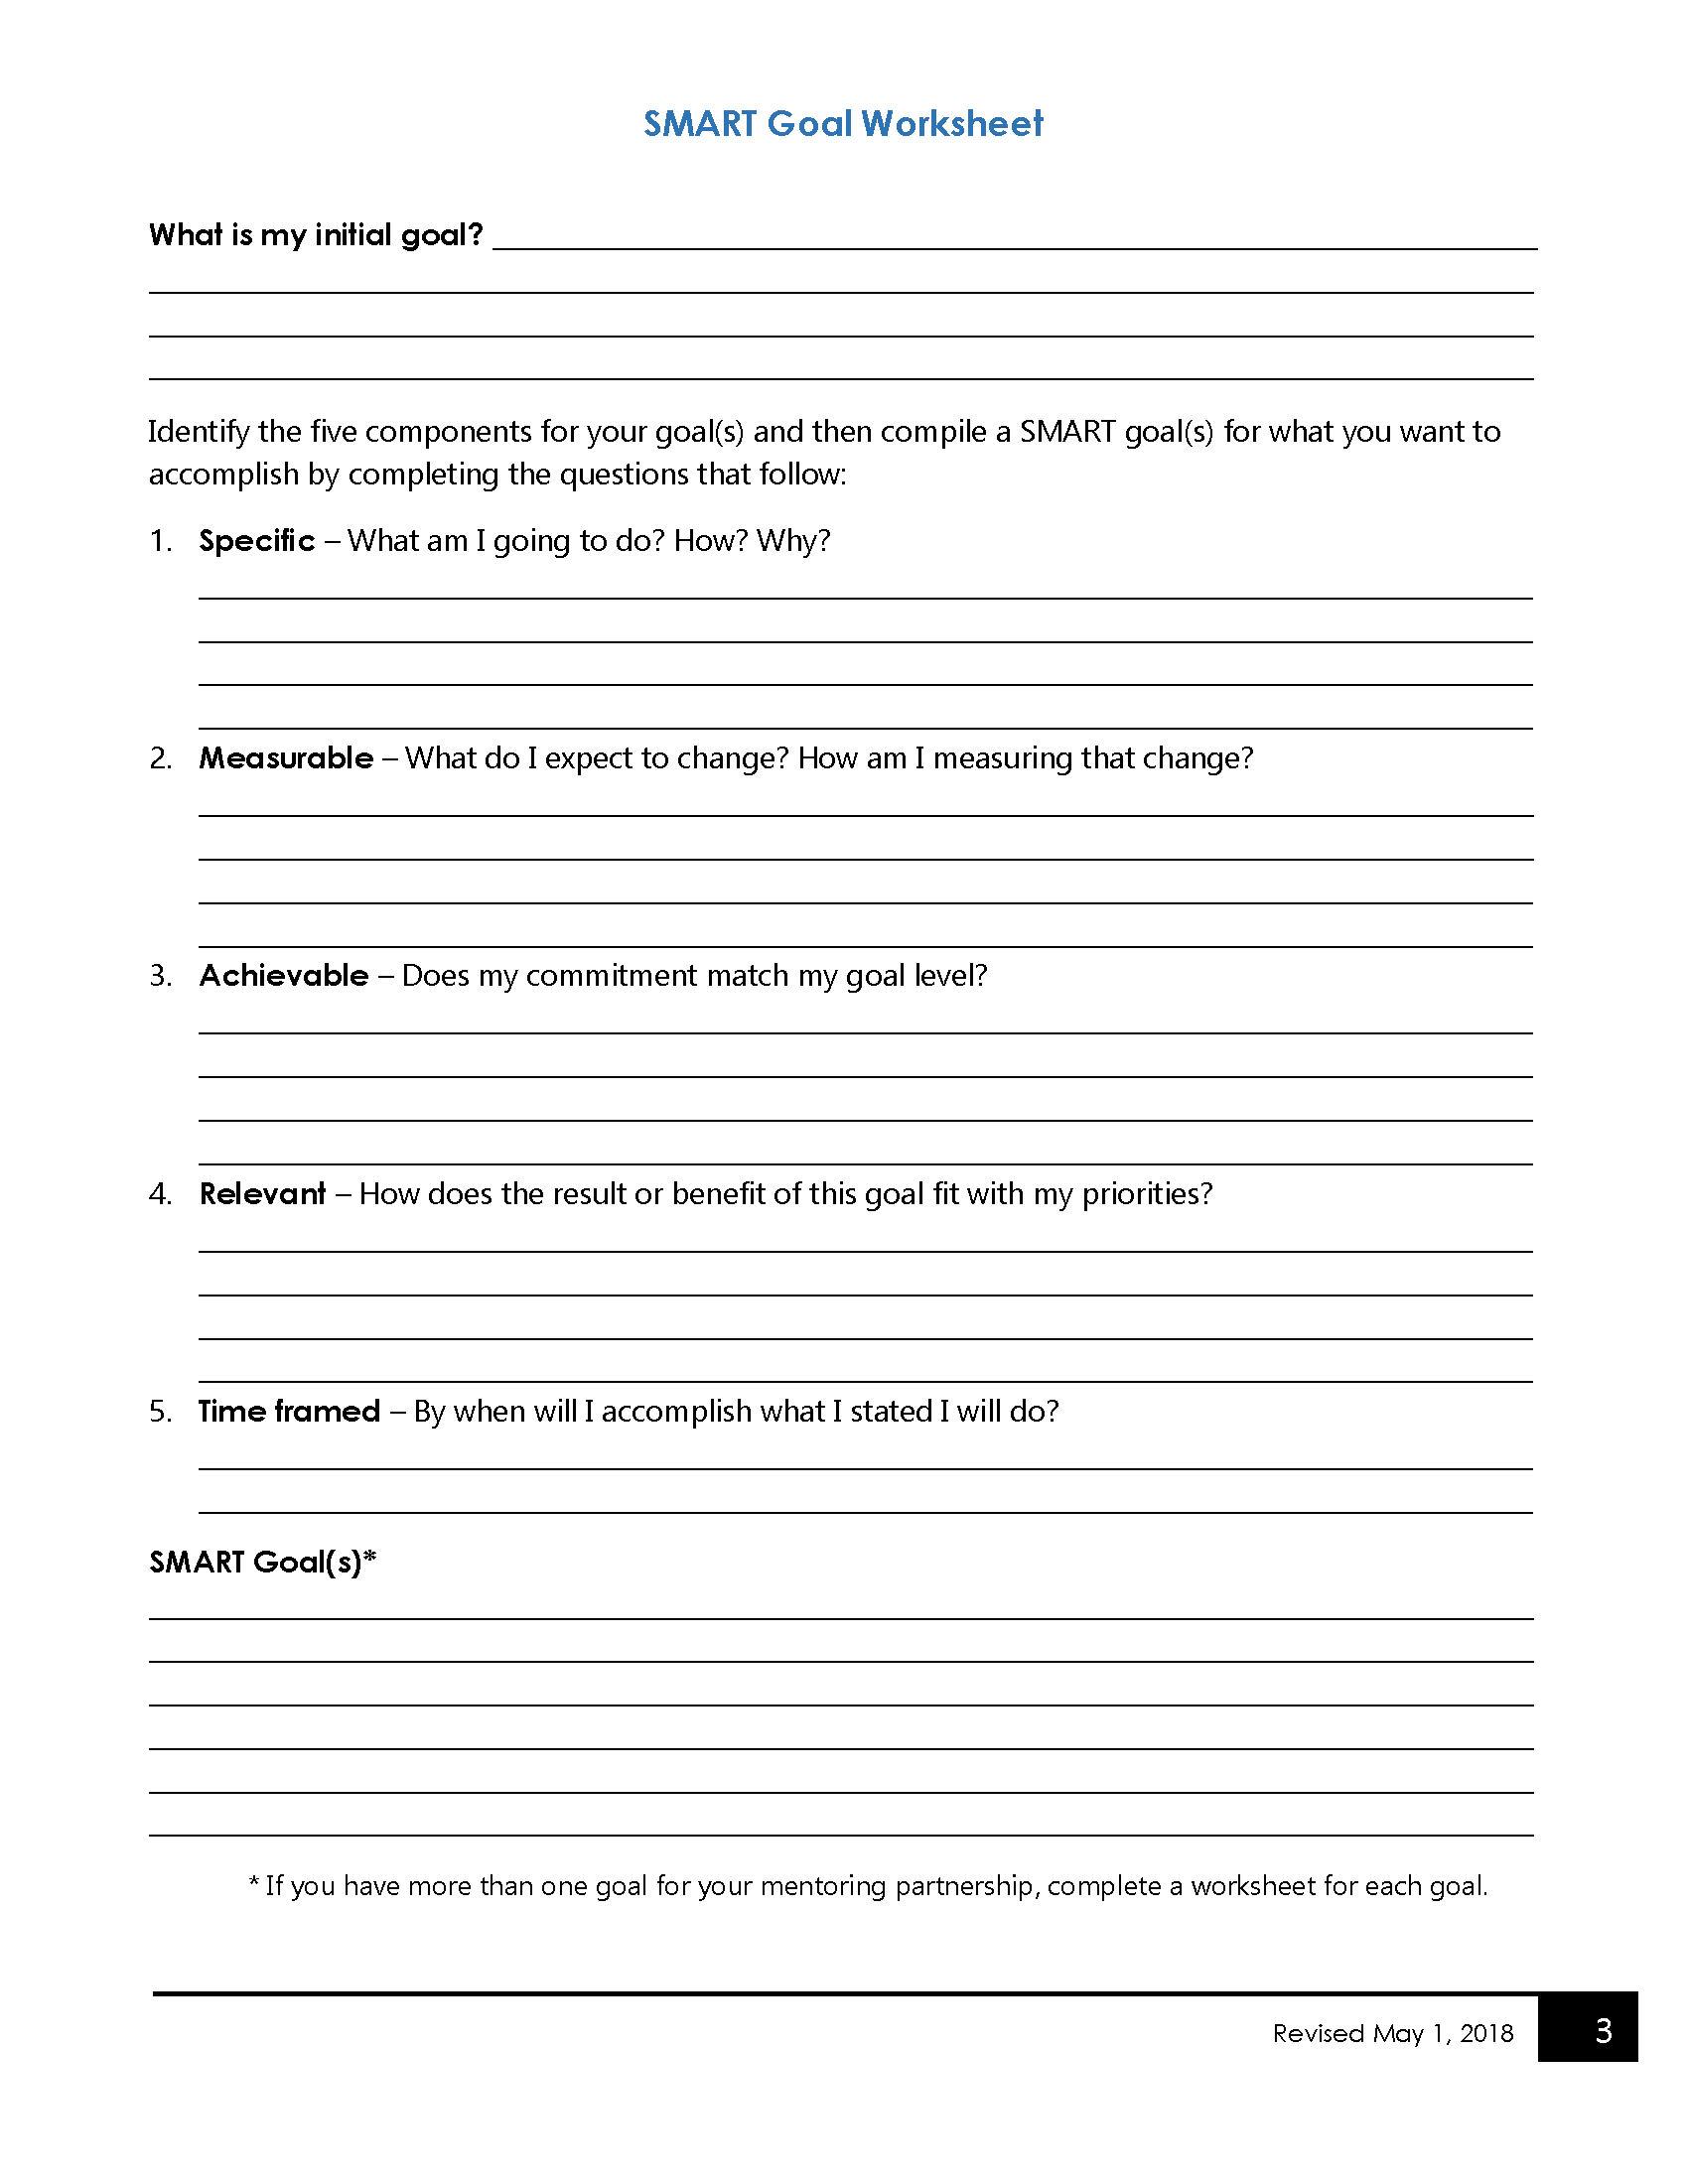 Worksheet For Youth Mentoring